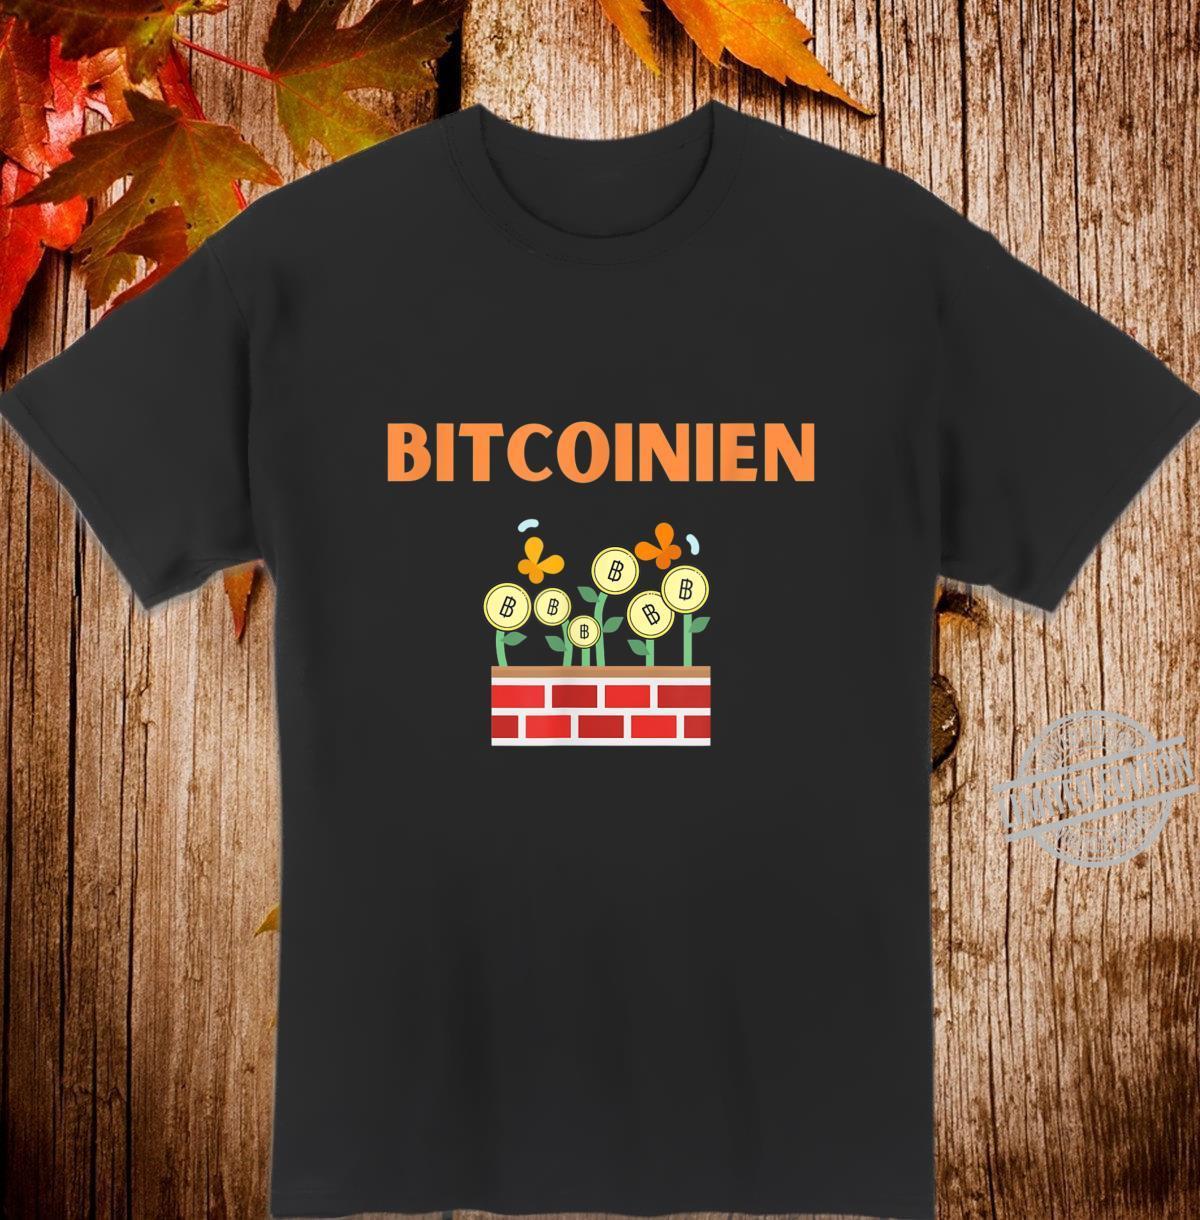 Bitcoin Krypto Blockchain Kryptowährung Geschenkidee Shirt